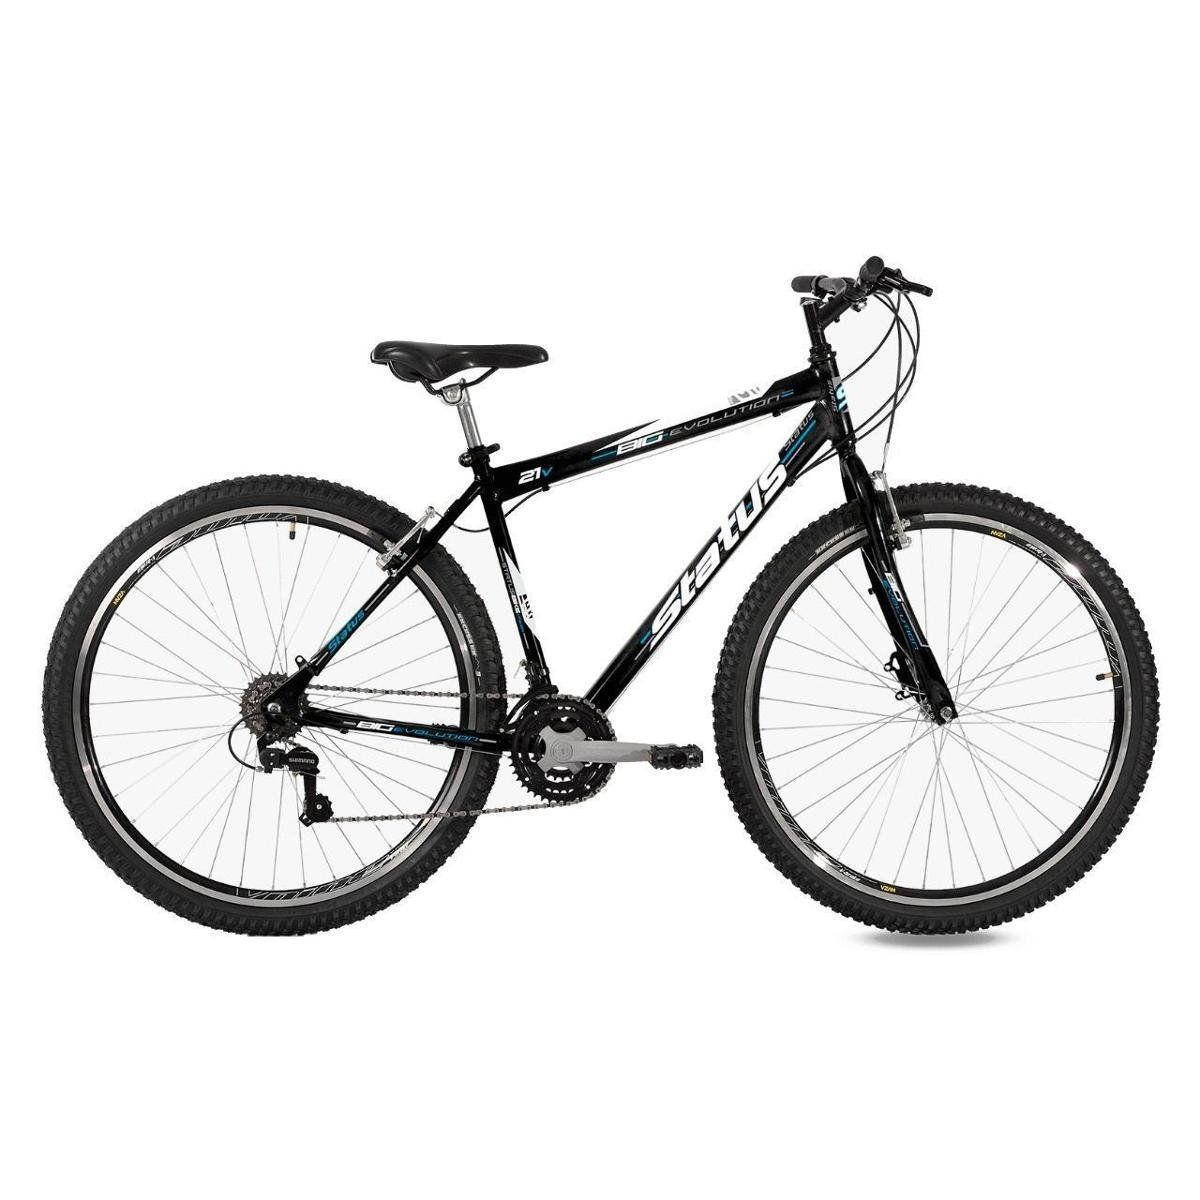 Bicicleta Status Big Evolution Aro 29 V-Brake - Preto